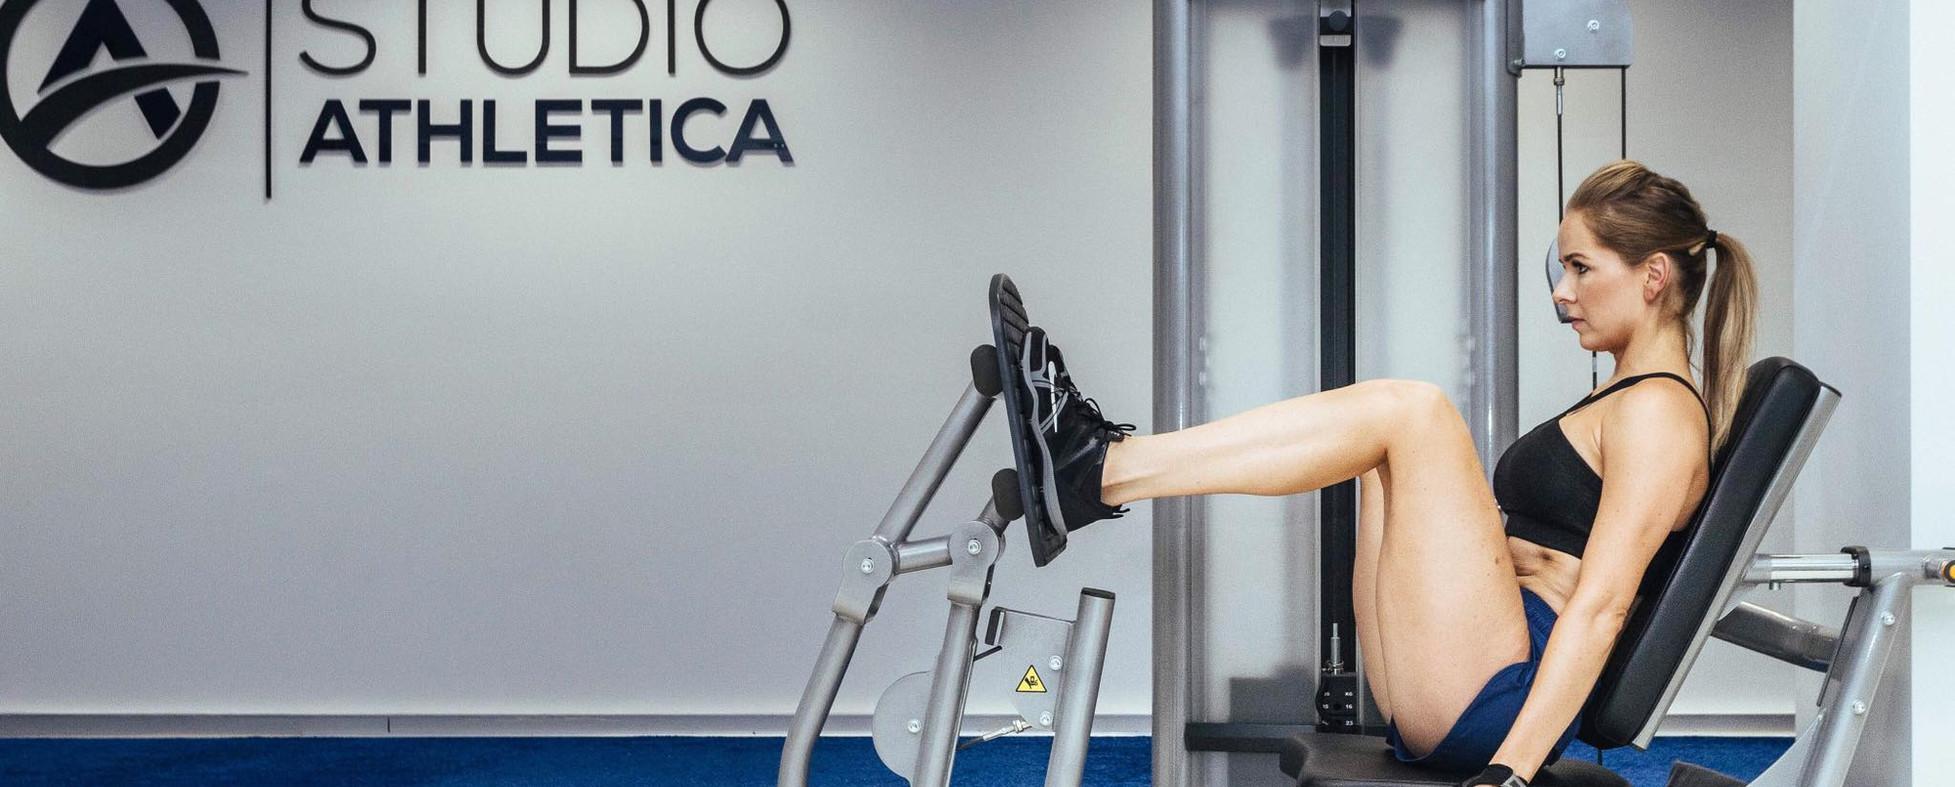 Studio Athletica.jpg